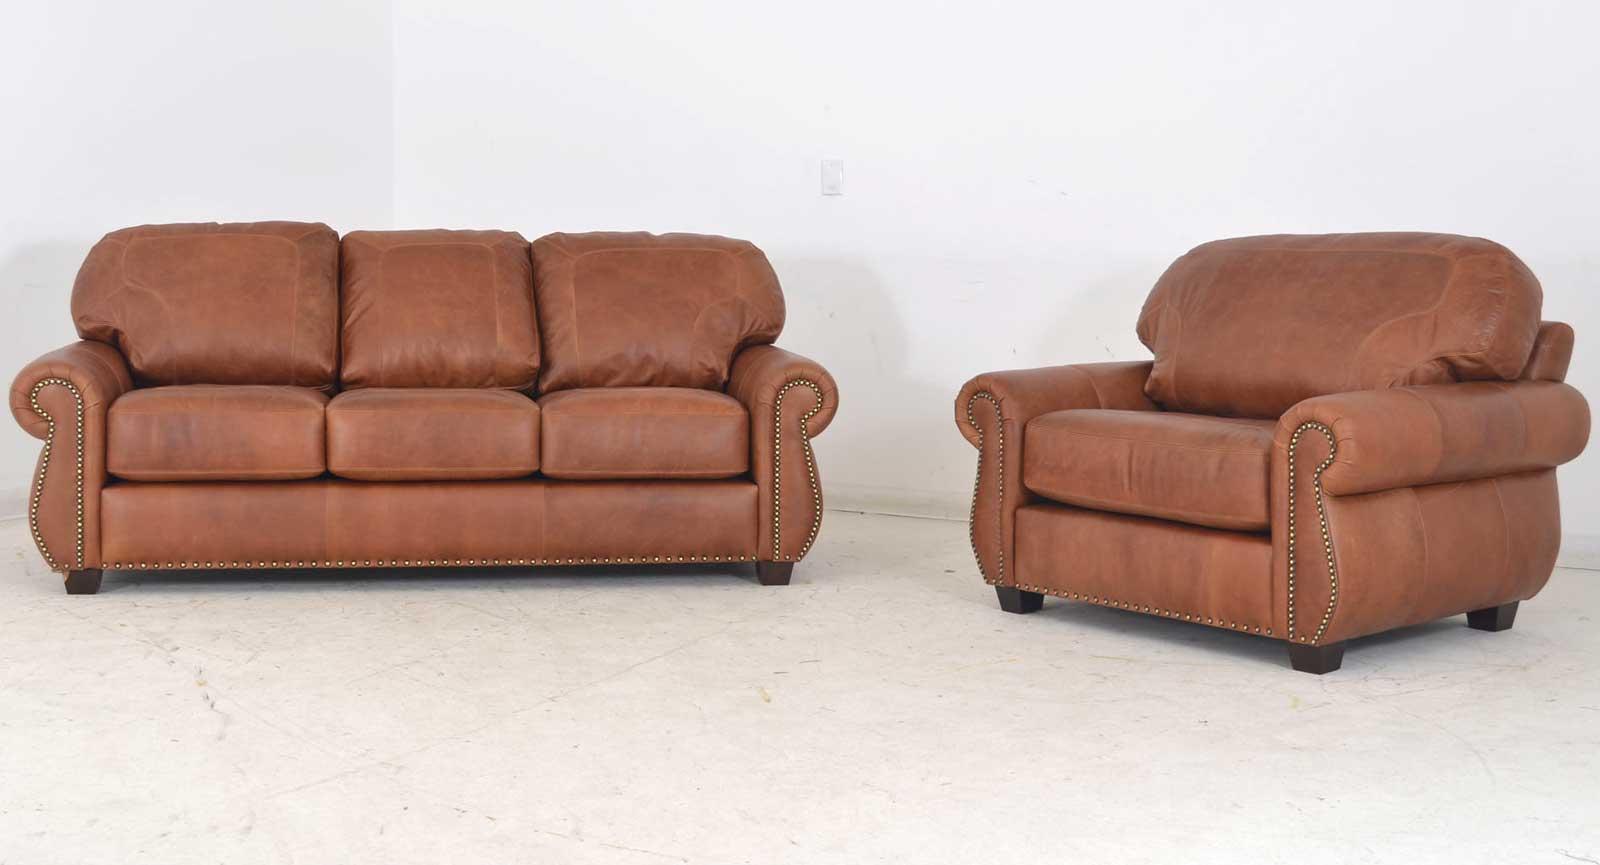 Sofa Chair And Half